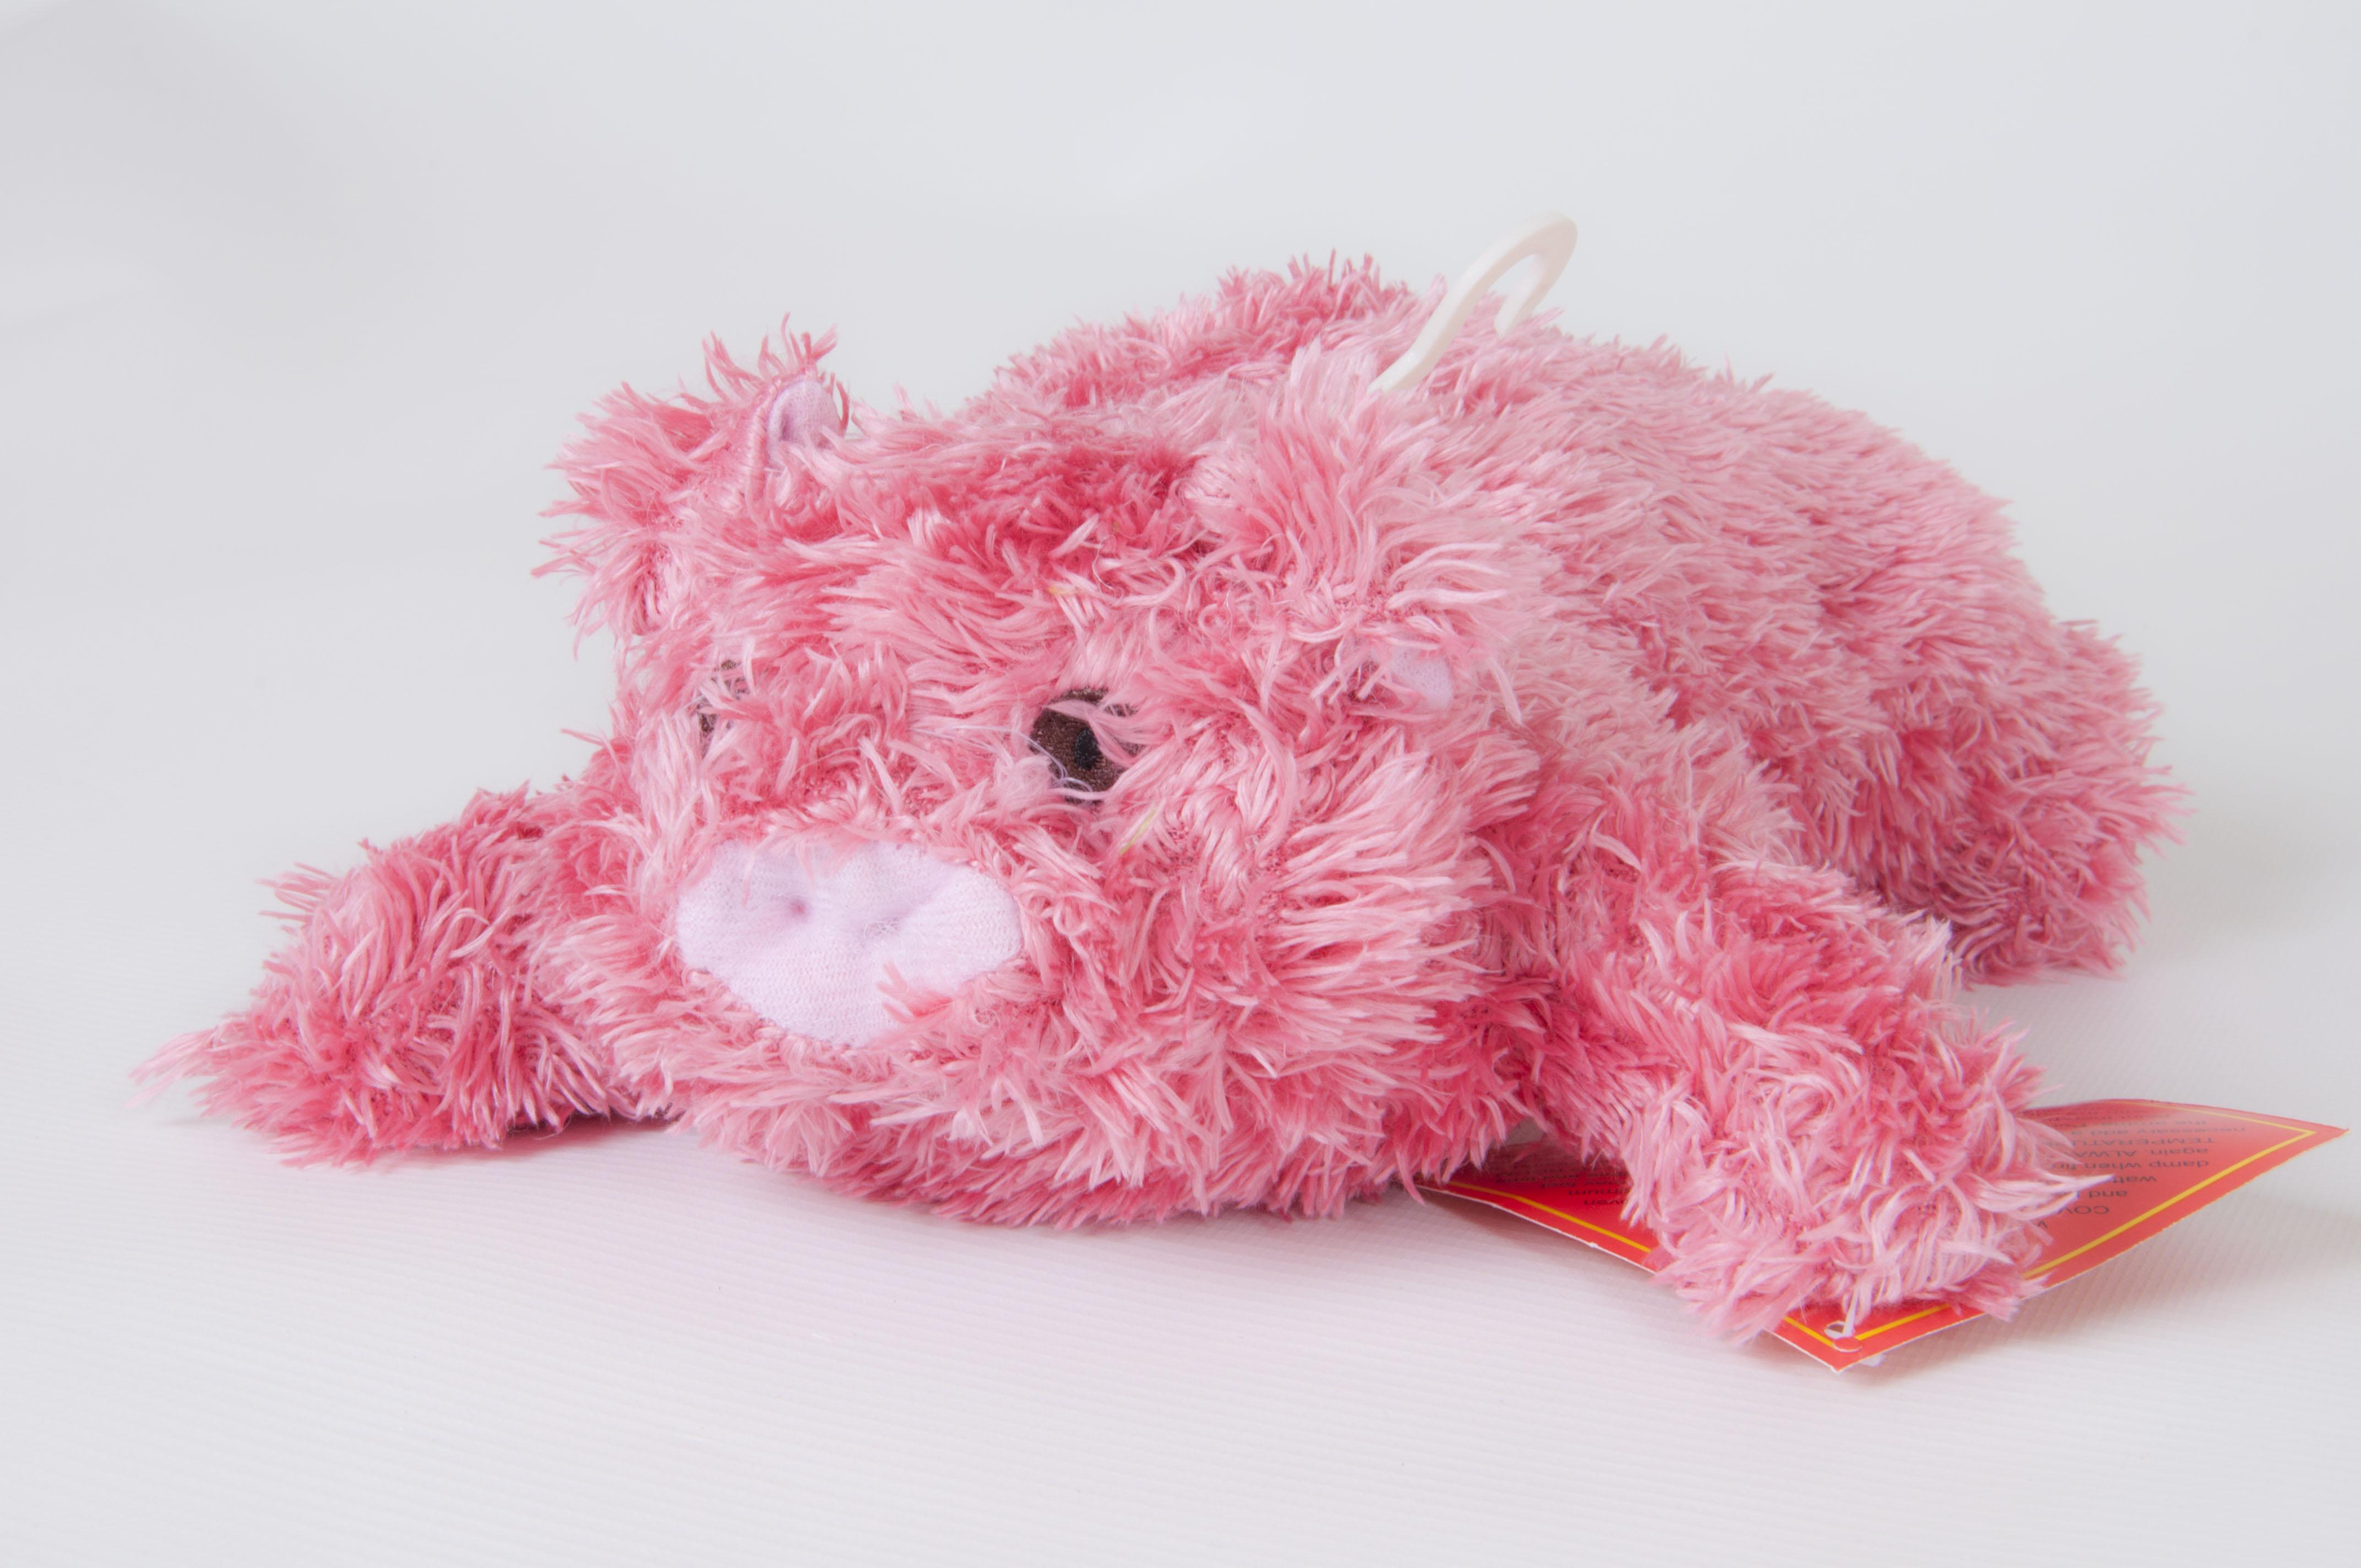 Children Plush Microwaveable comforter/Toy with Lavender Animal Piglet Design